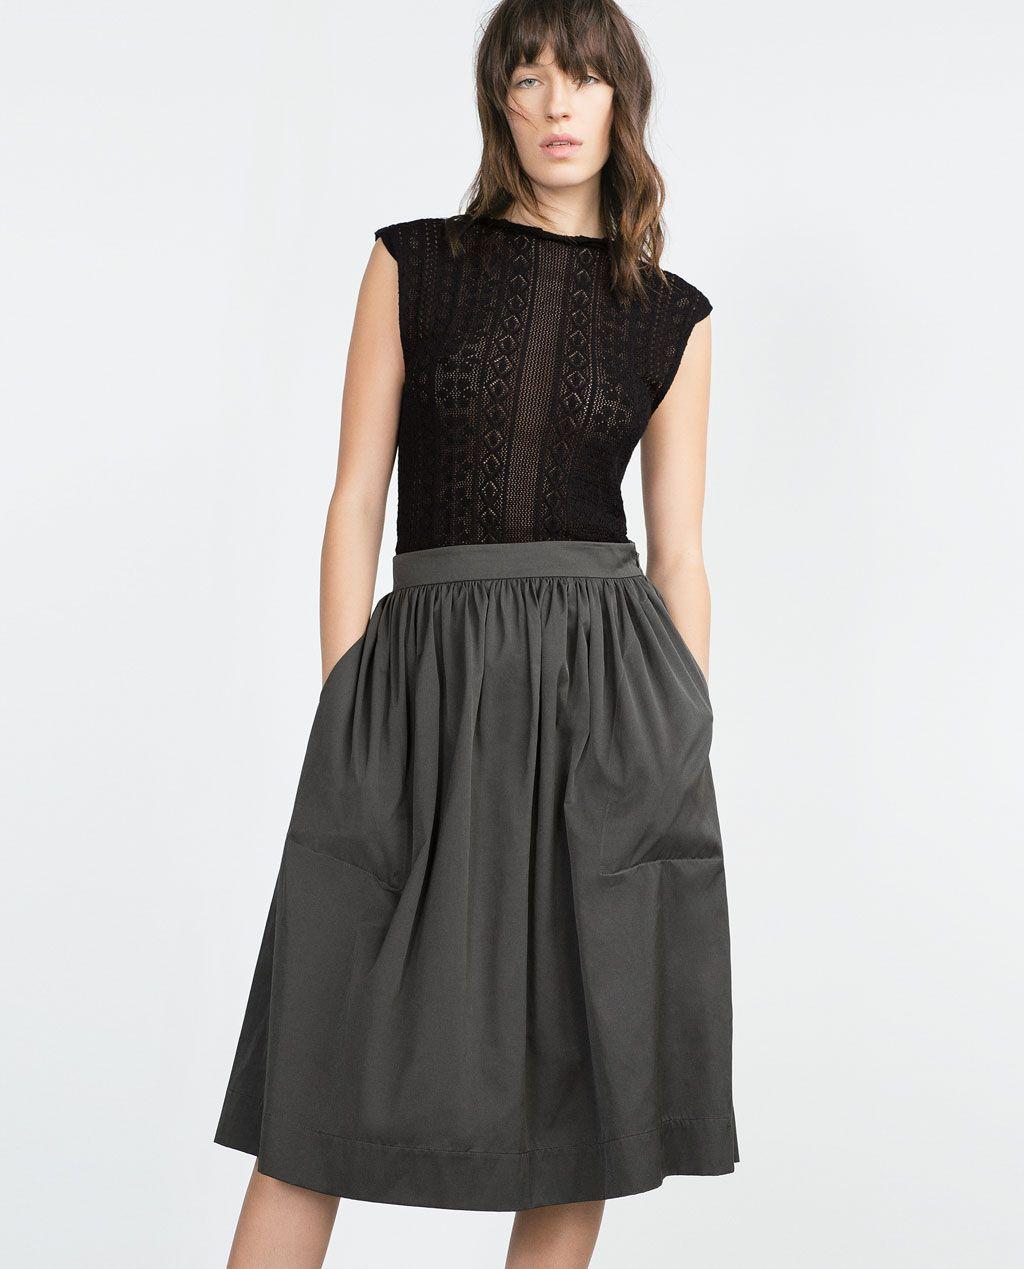 Longue 40€ Falda De Con Vuelo Midi Jupe Mi Negra Zara w11fUq